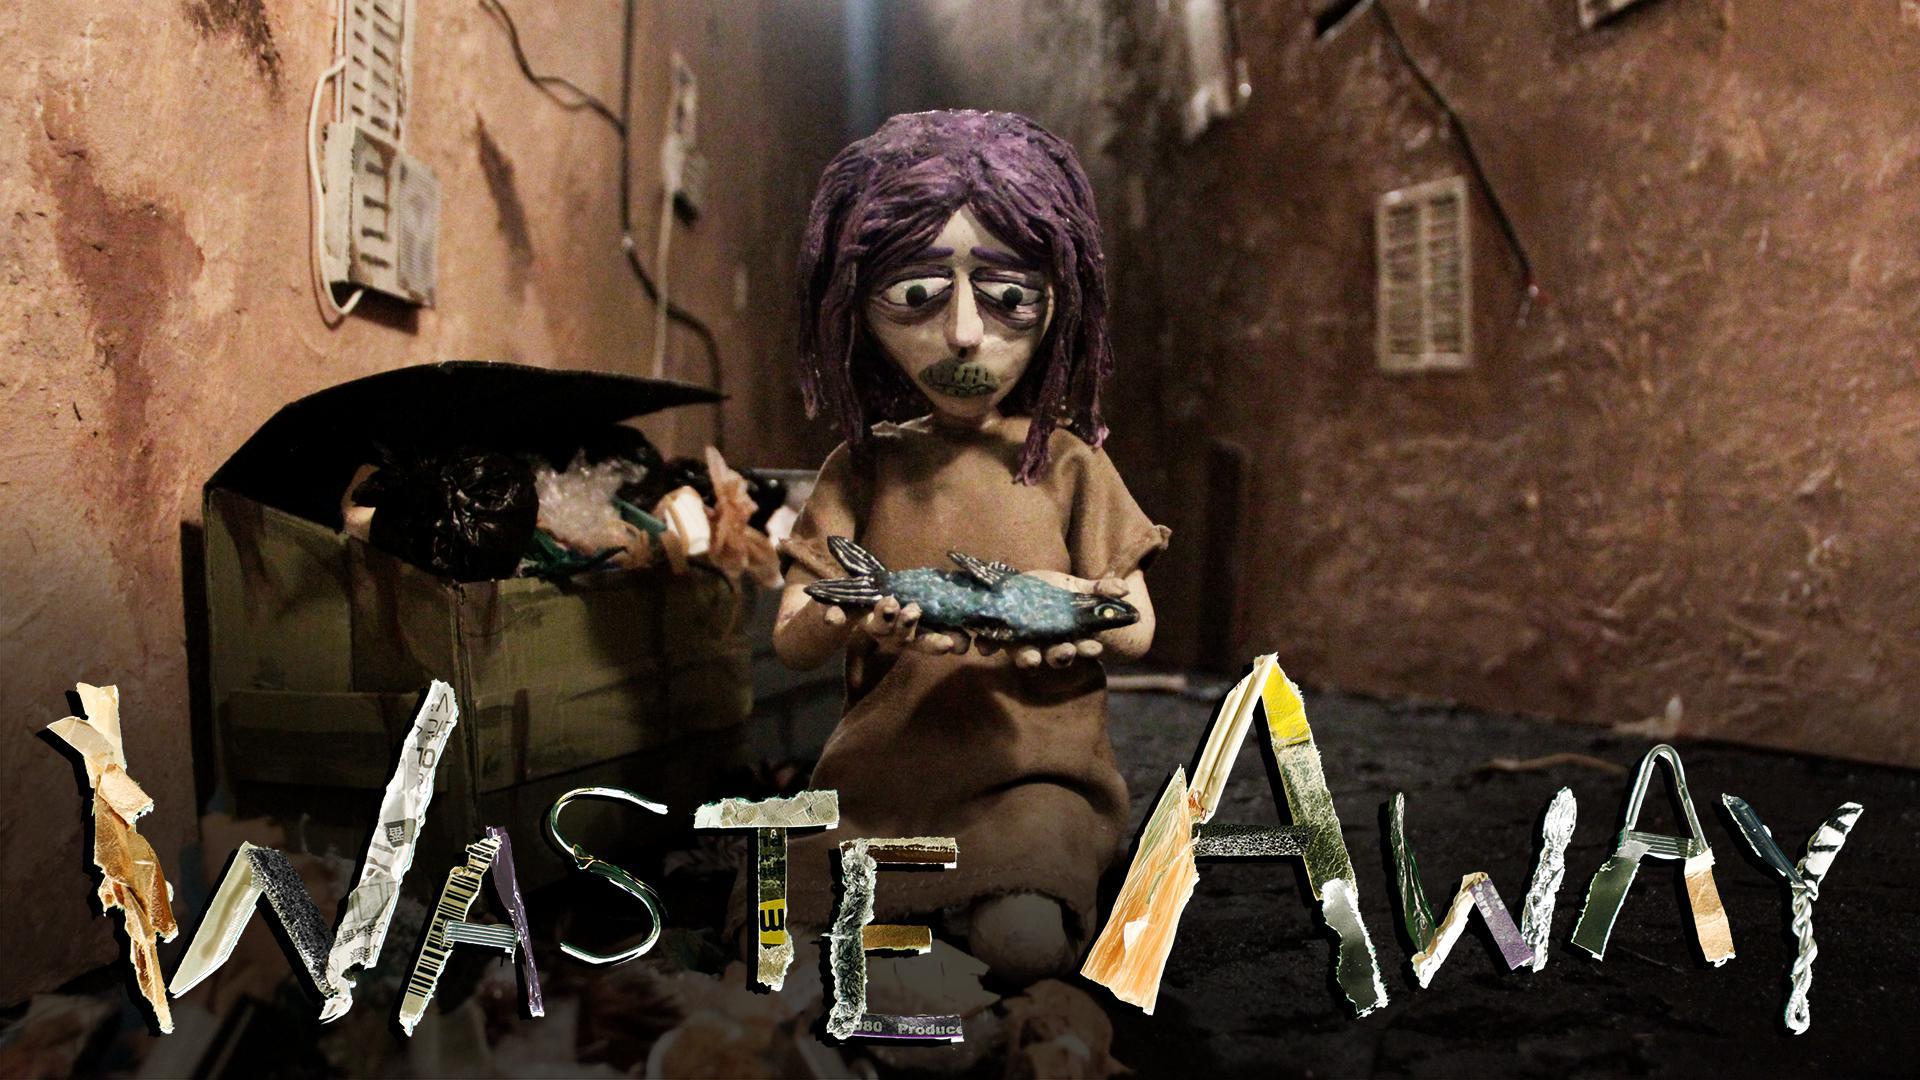 Waste Away